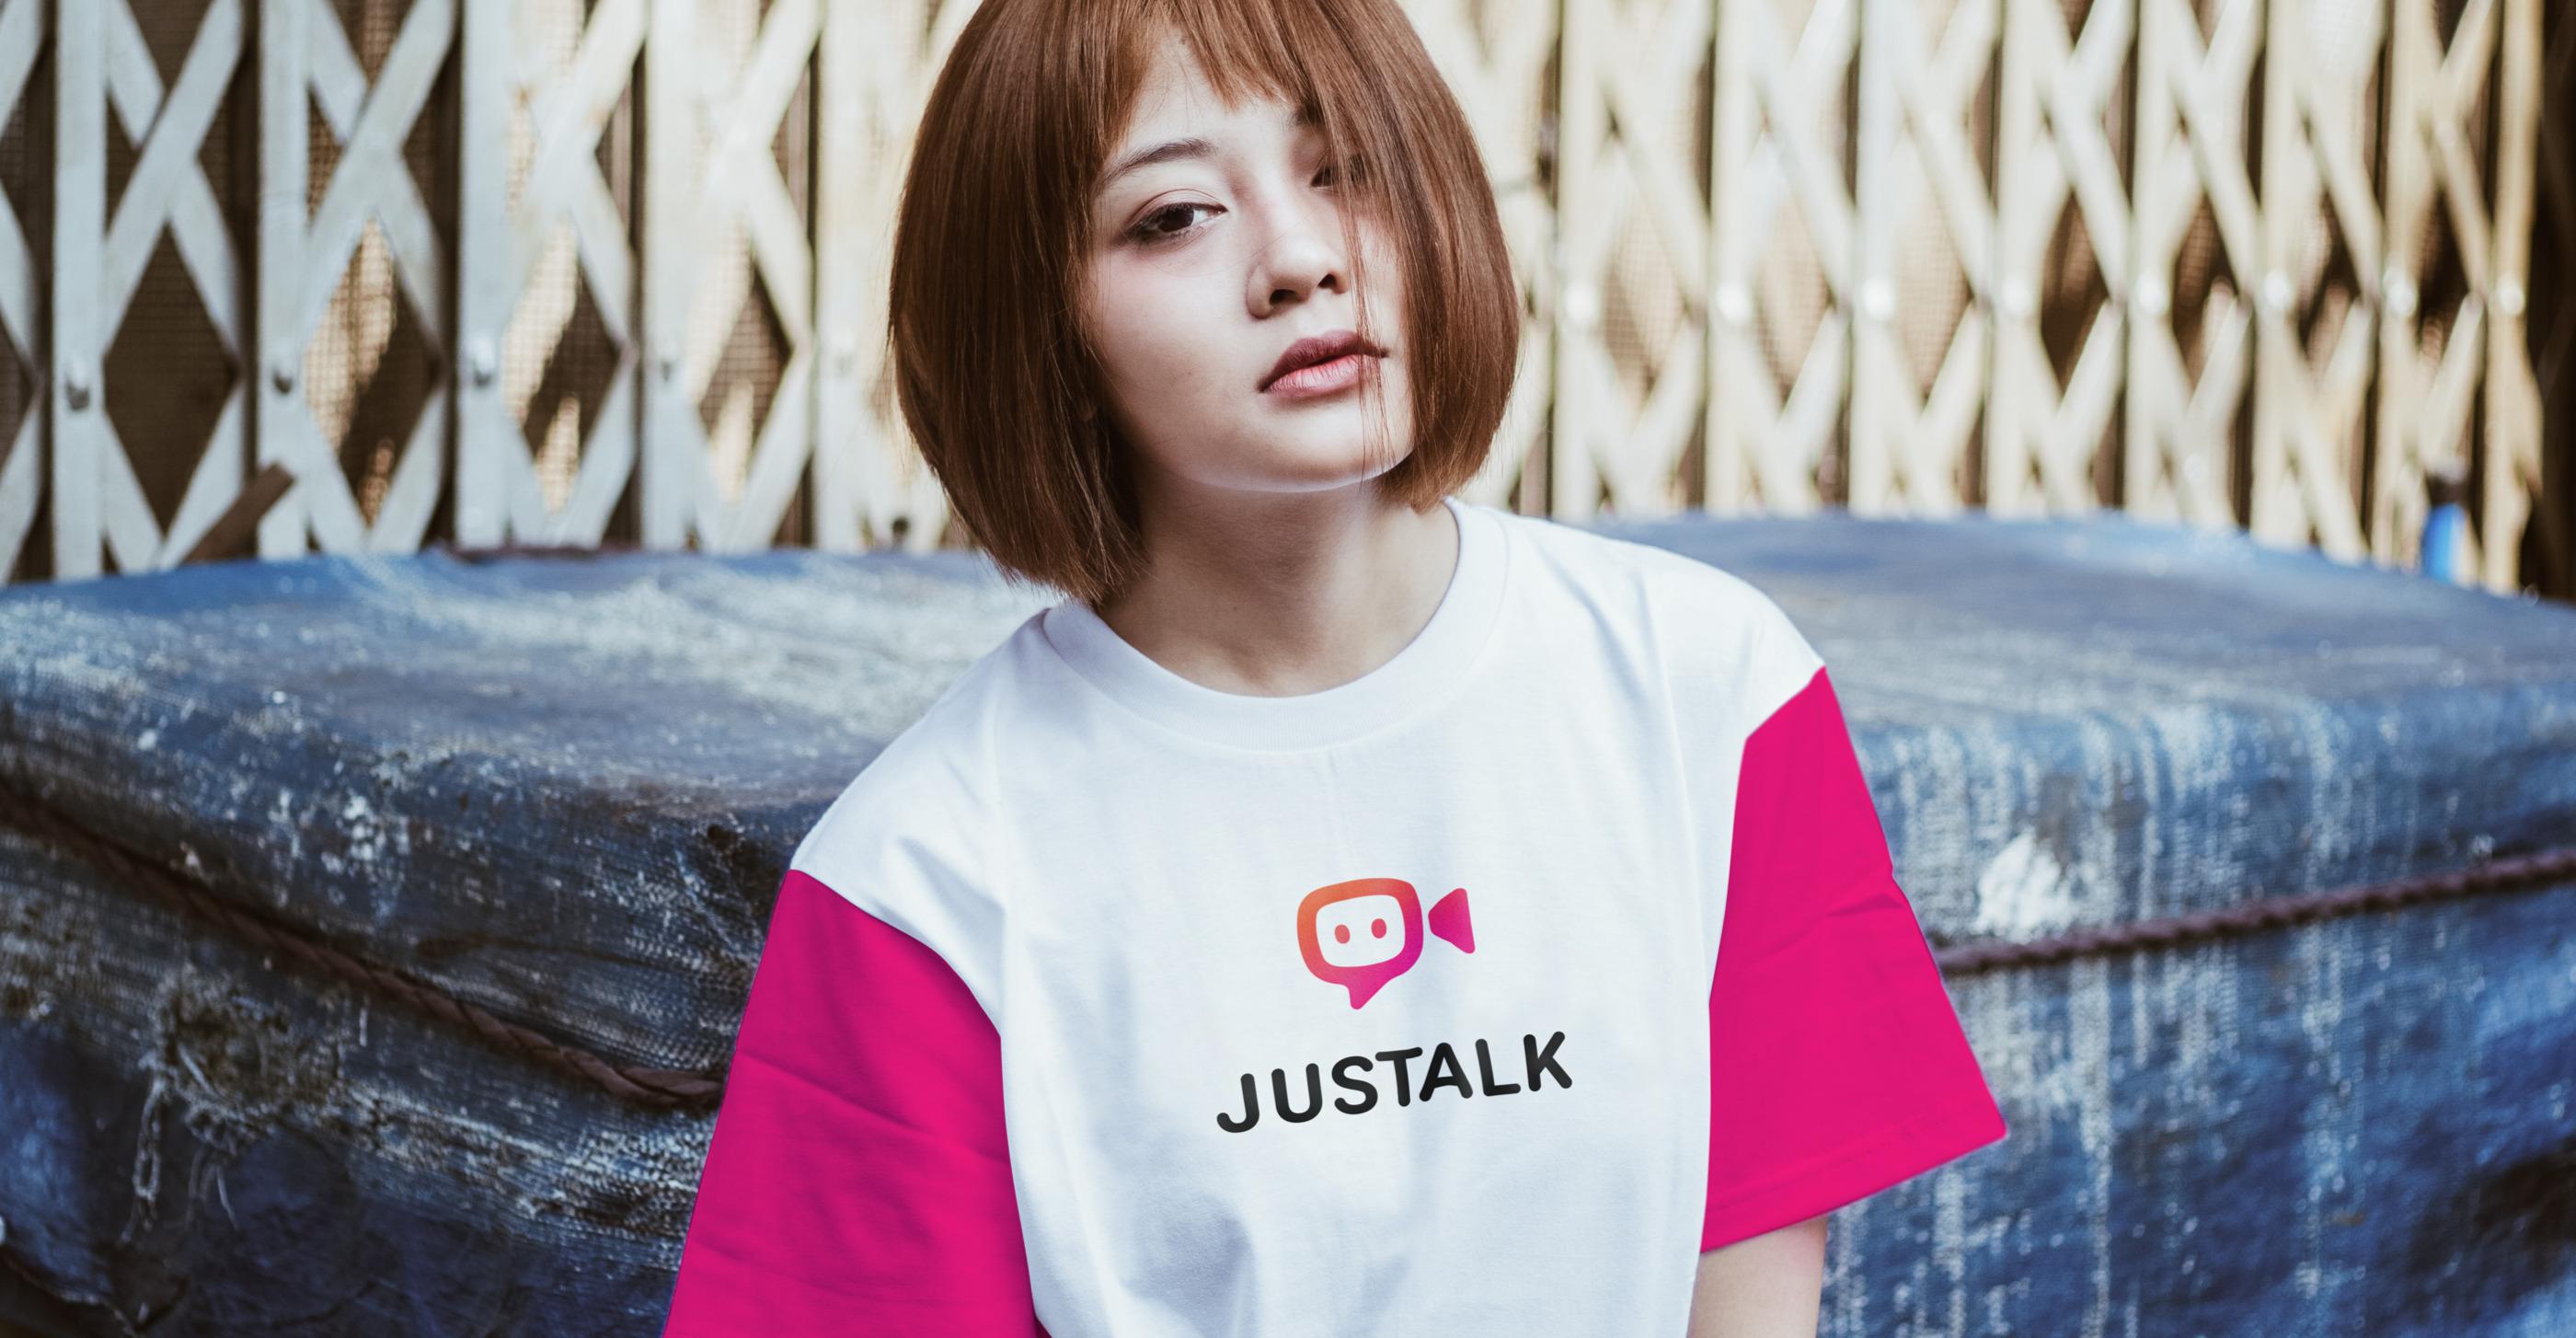 justalk t-shirt